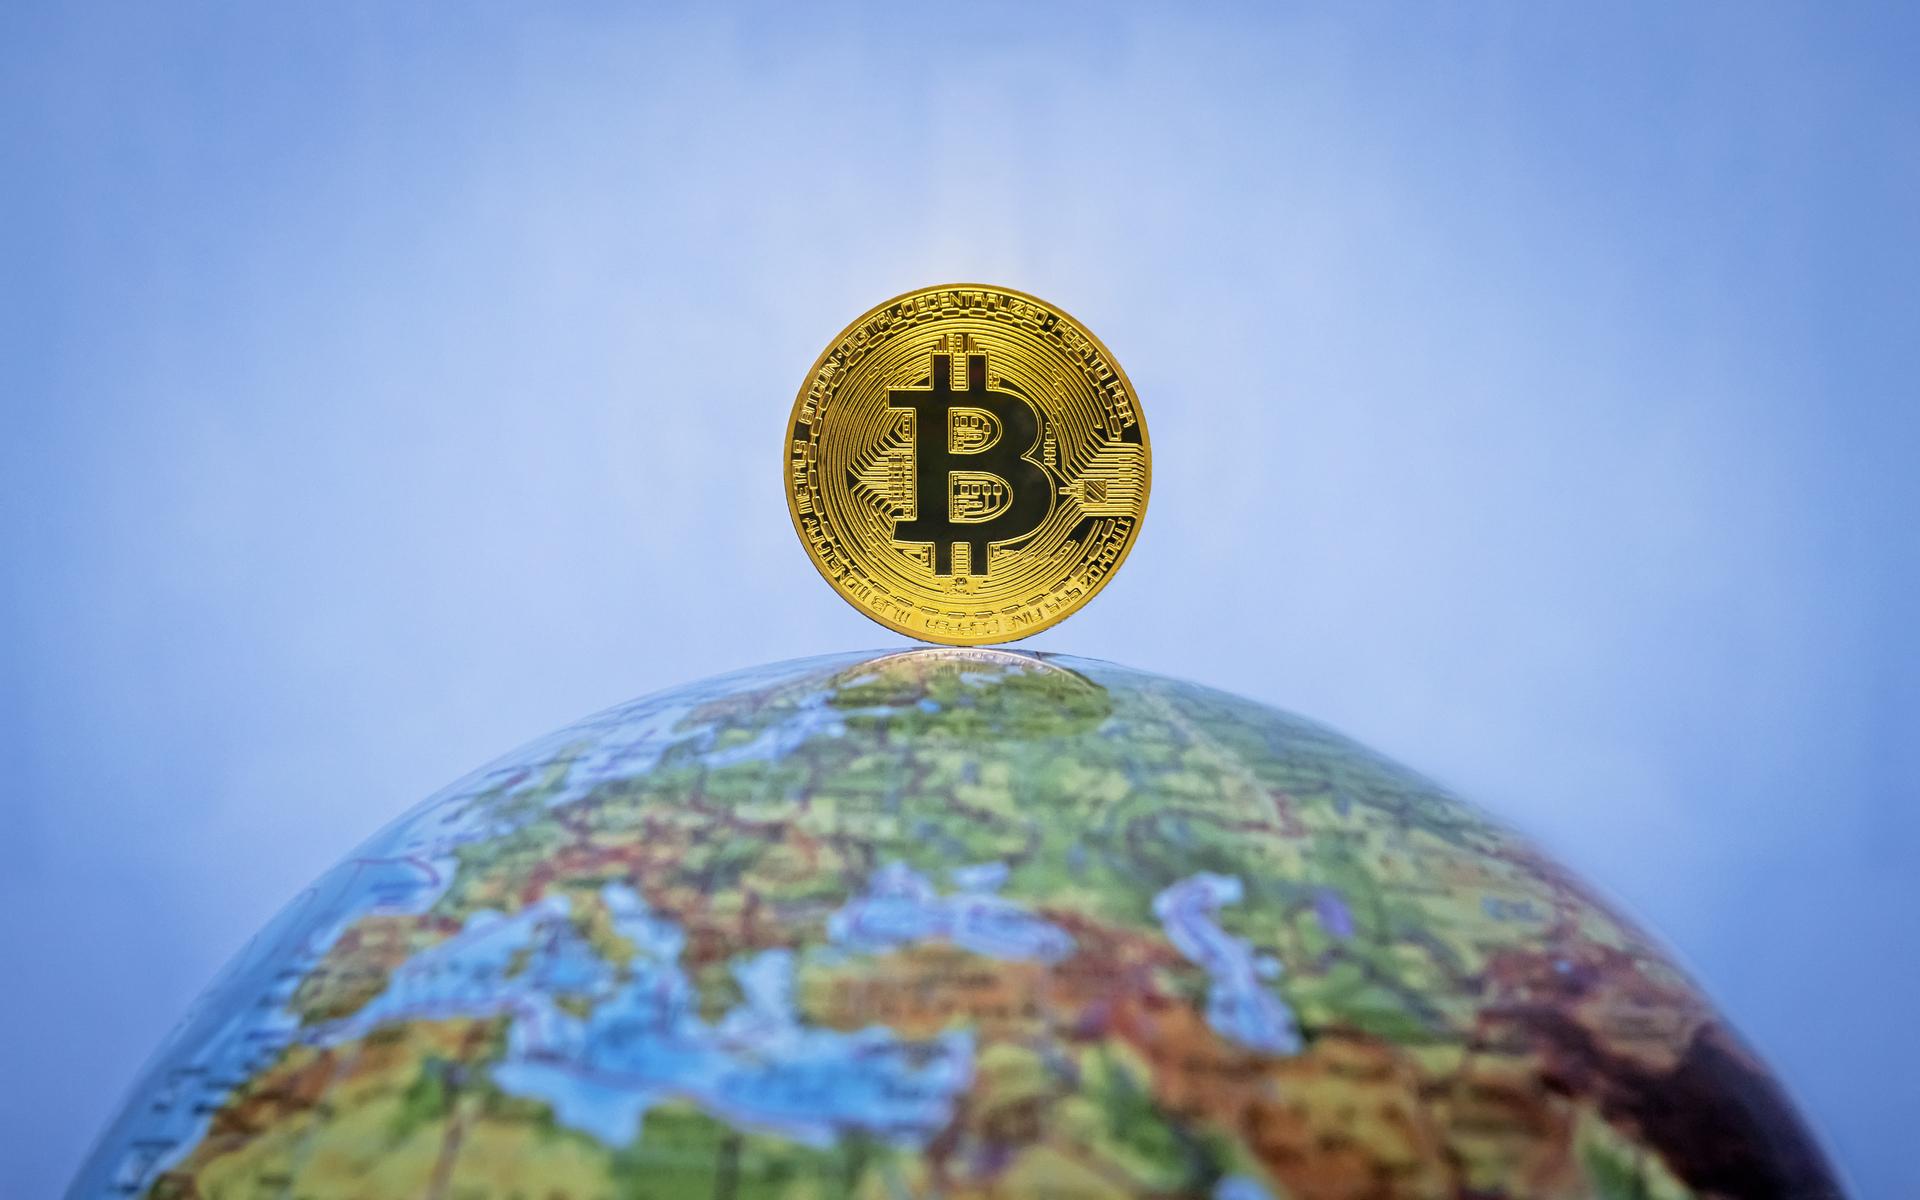 Glbse bitcoins online betting usa sites